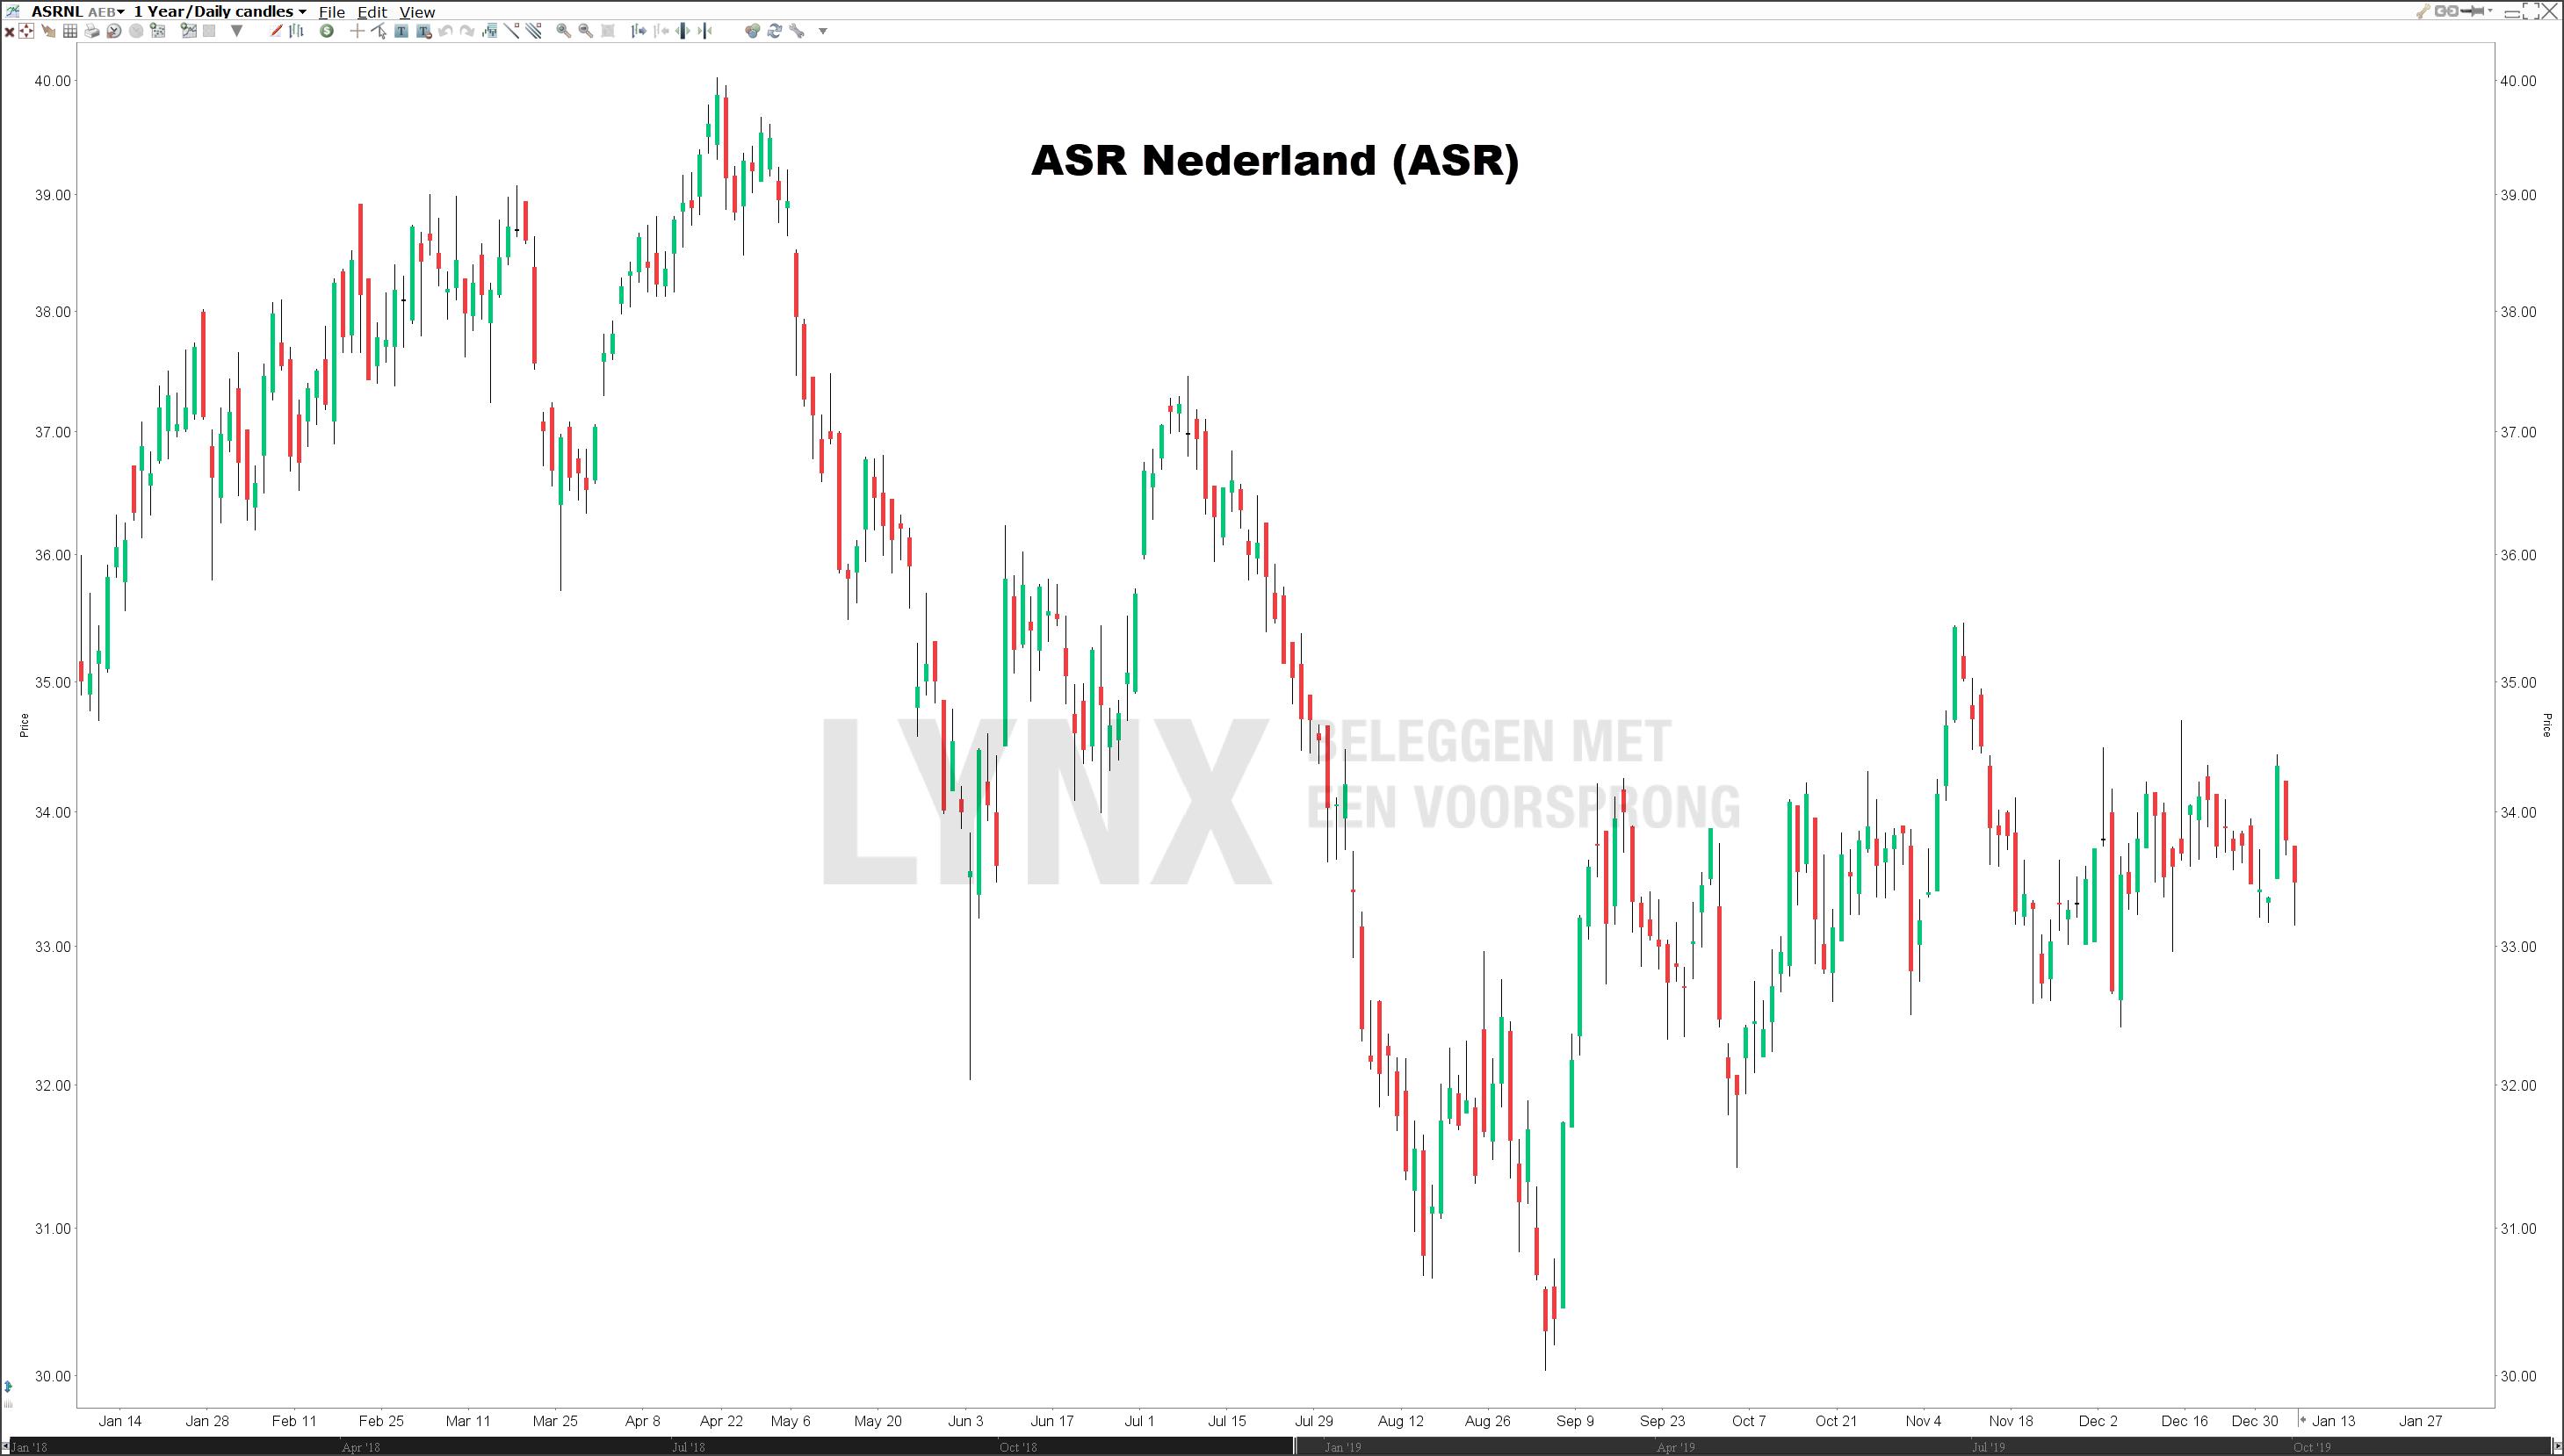 Koers ASR Nederlandse dividendaandelen